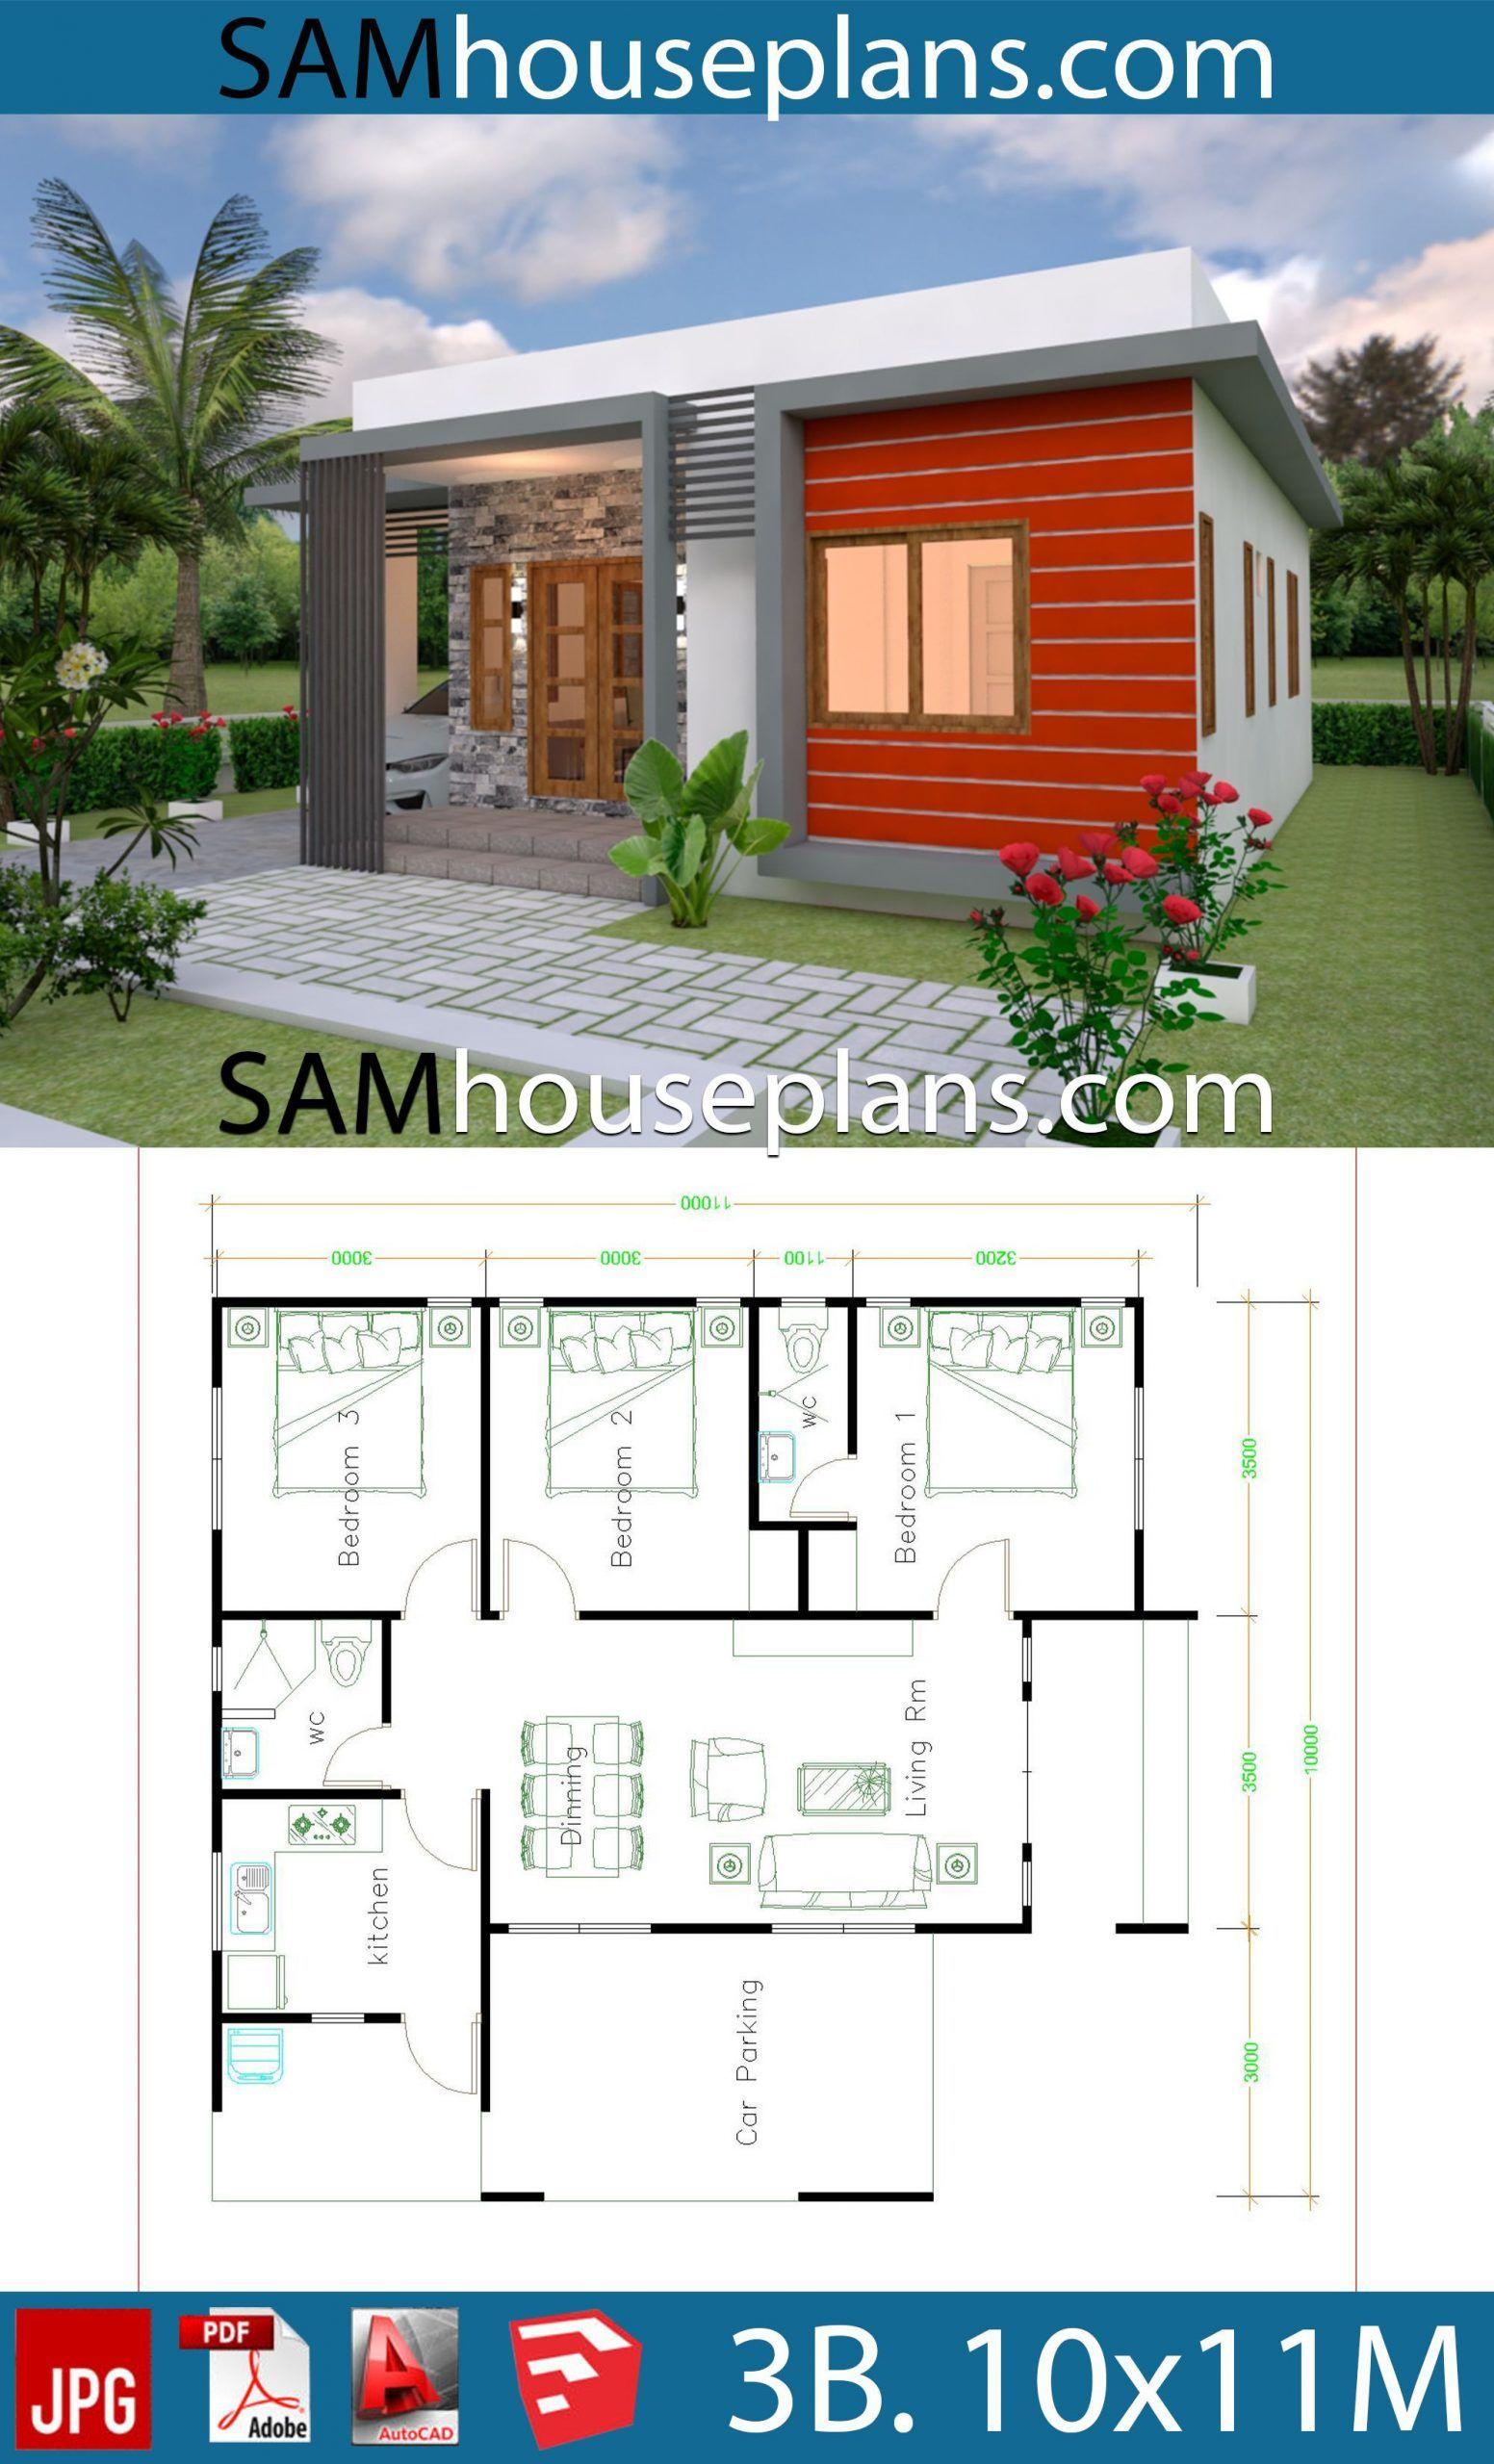 House Building Plans Free Download 2021 Beautiful House Plans Modern House Plans Architectural Design House Plans